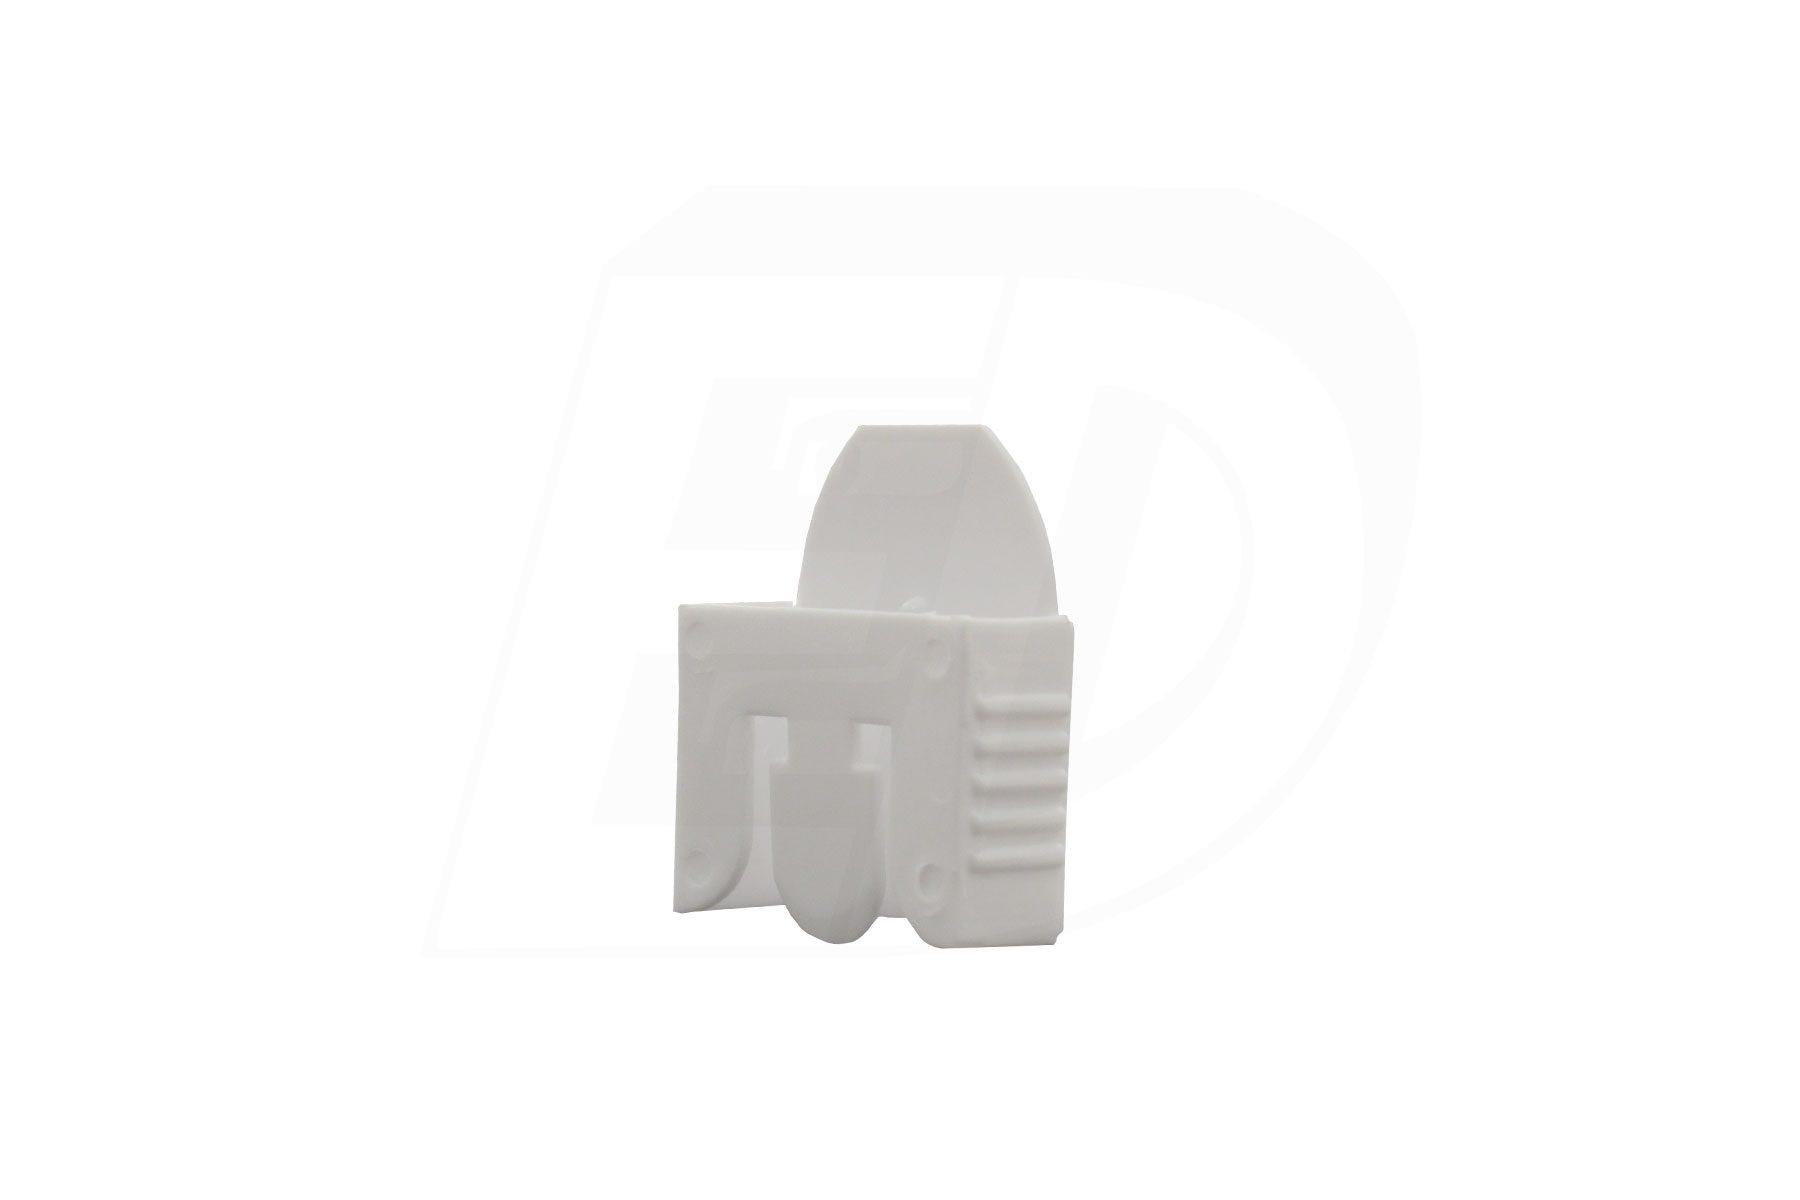 T12 Lamp Tube Lock Accessory